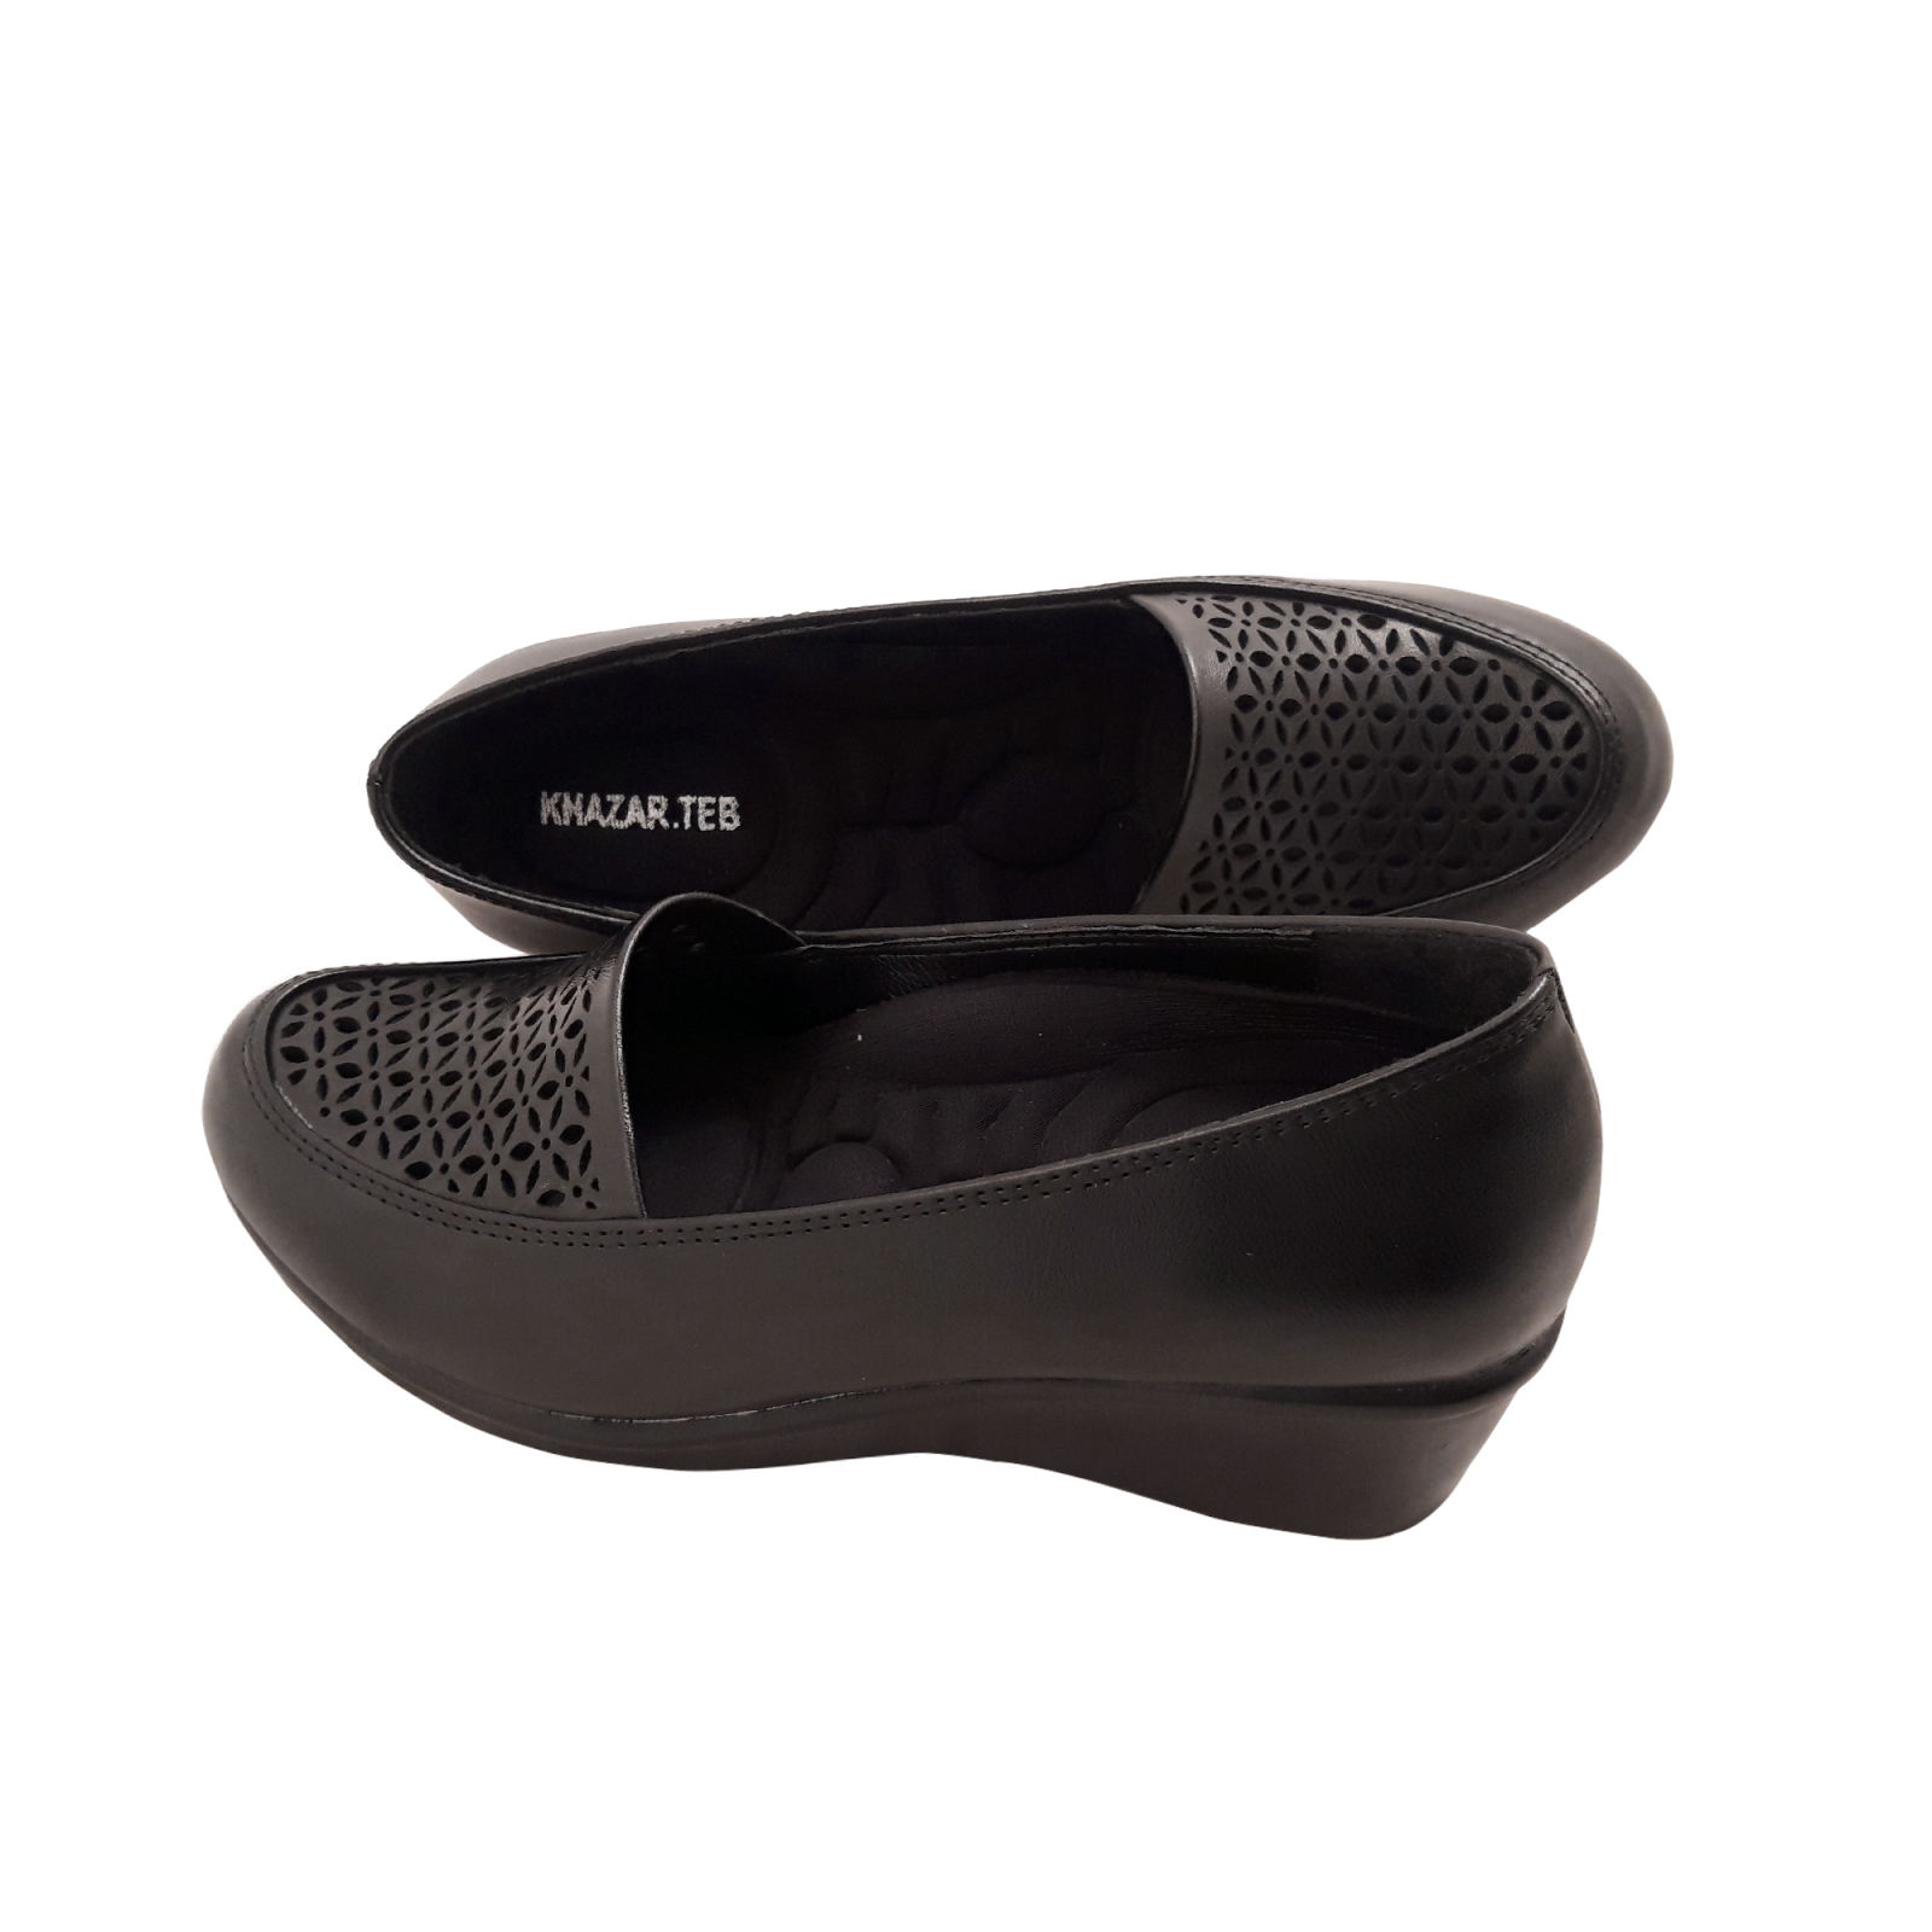 کفش روزمره زنانه خزر طب کد 409 main 1 3